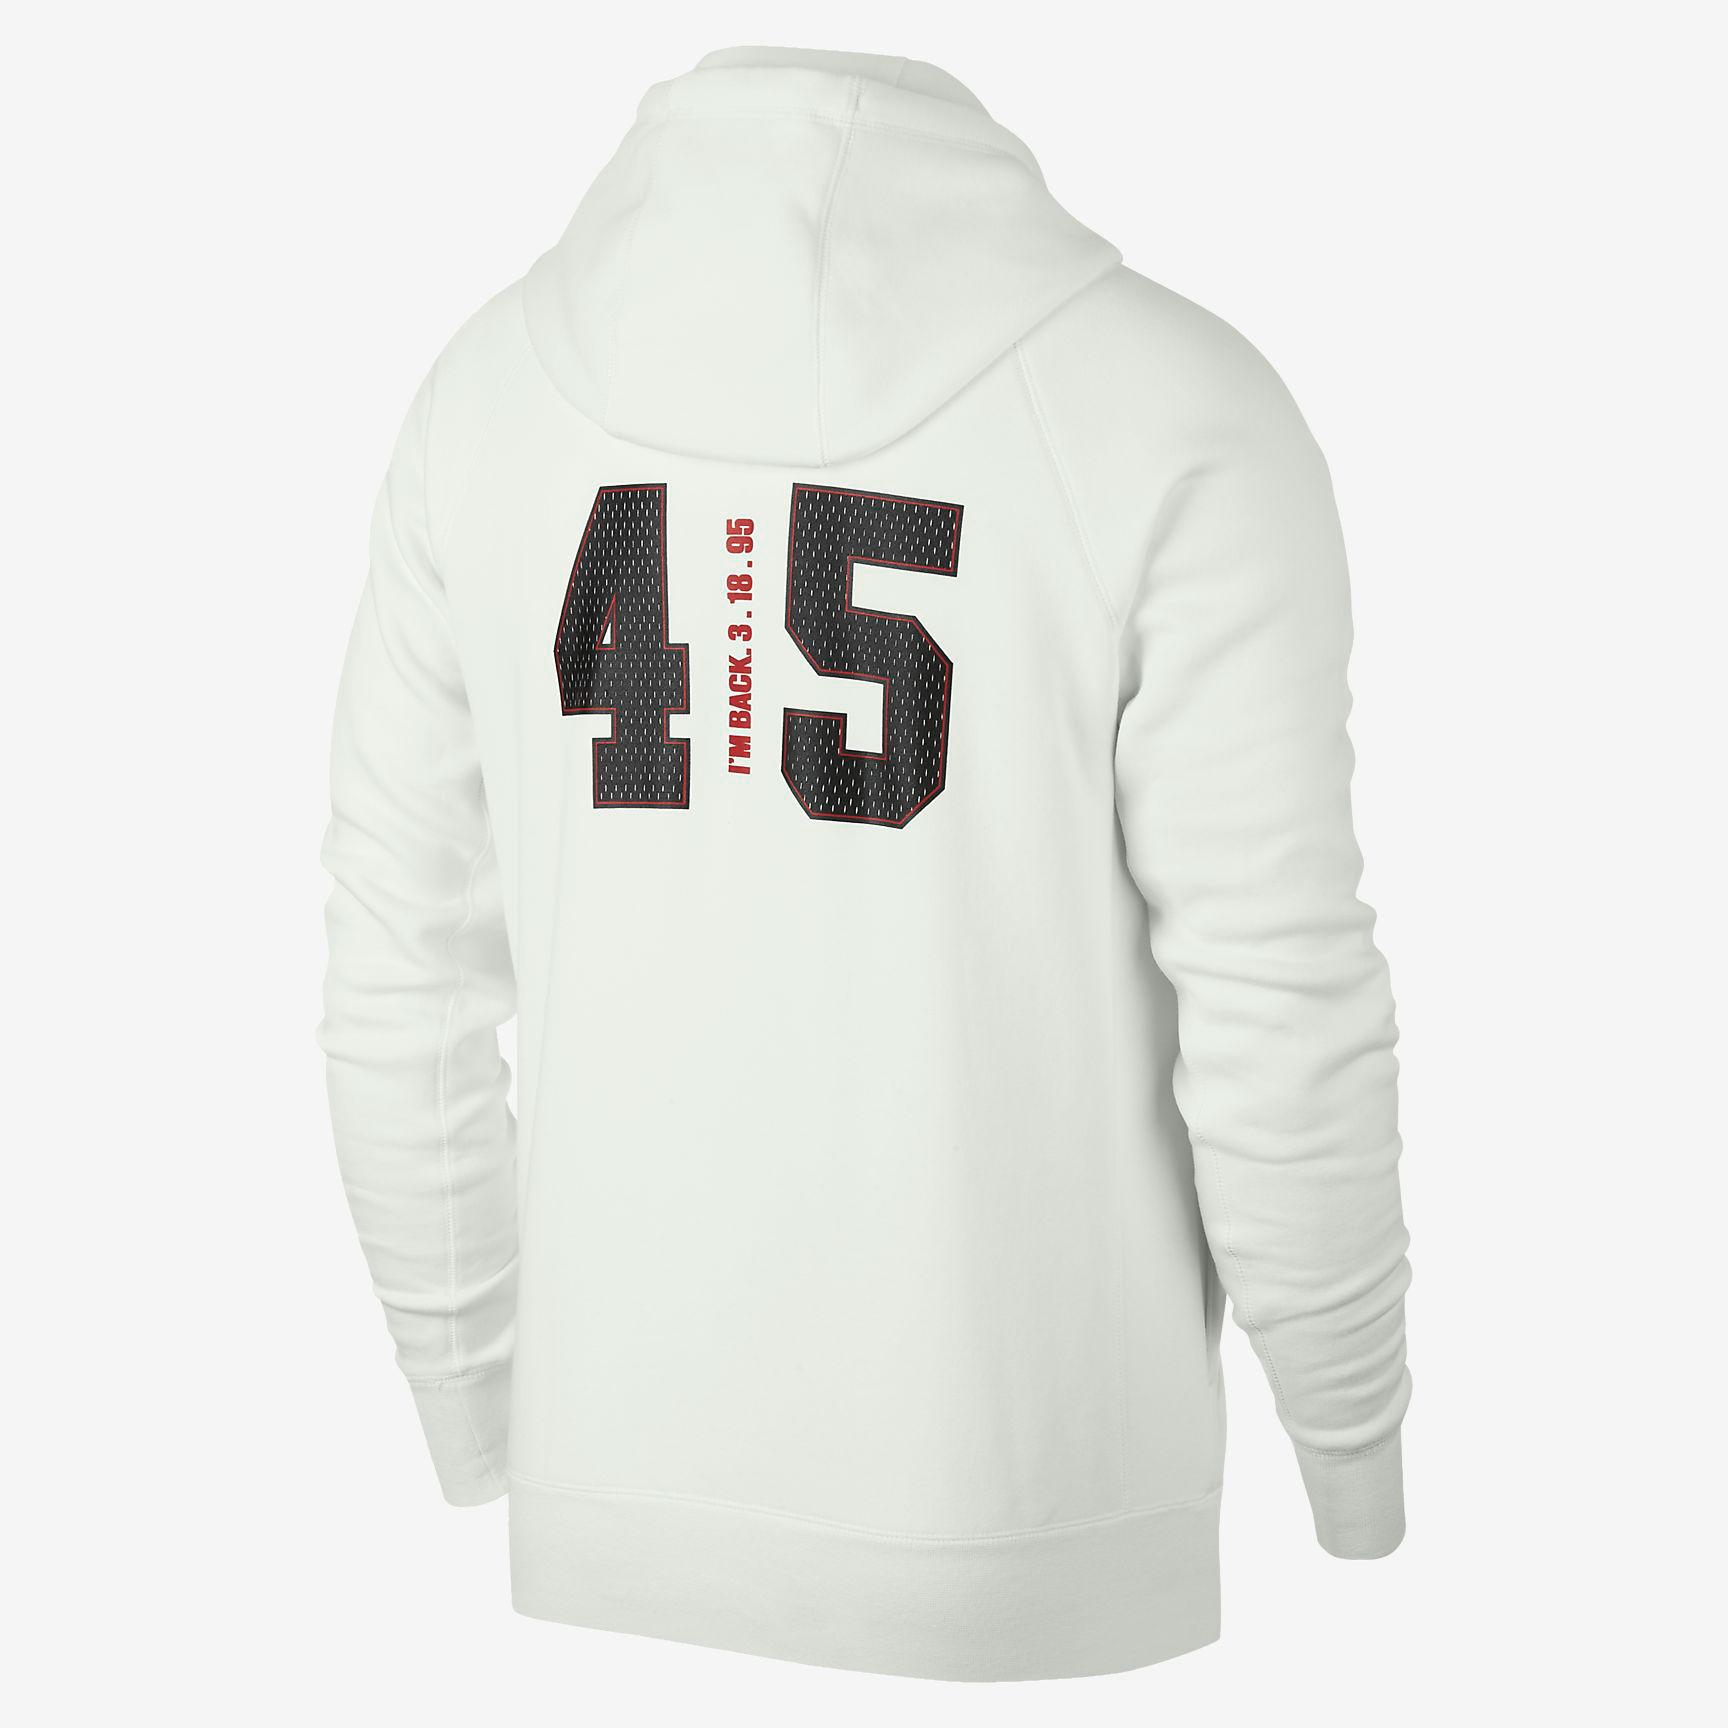 jordan-10-im-back-white-black-hoodie-2